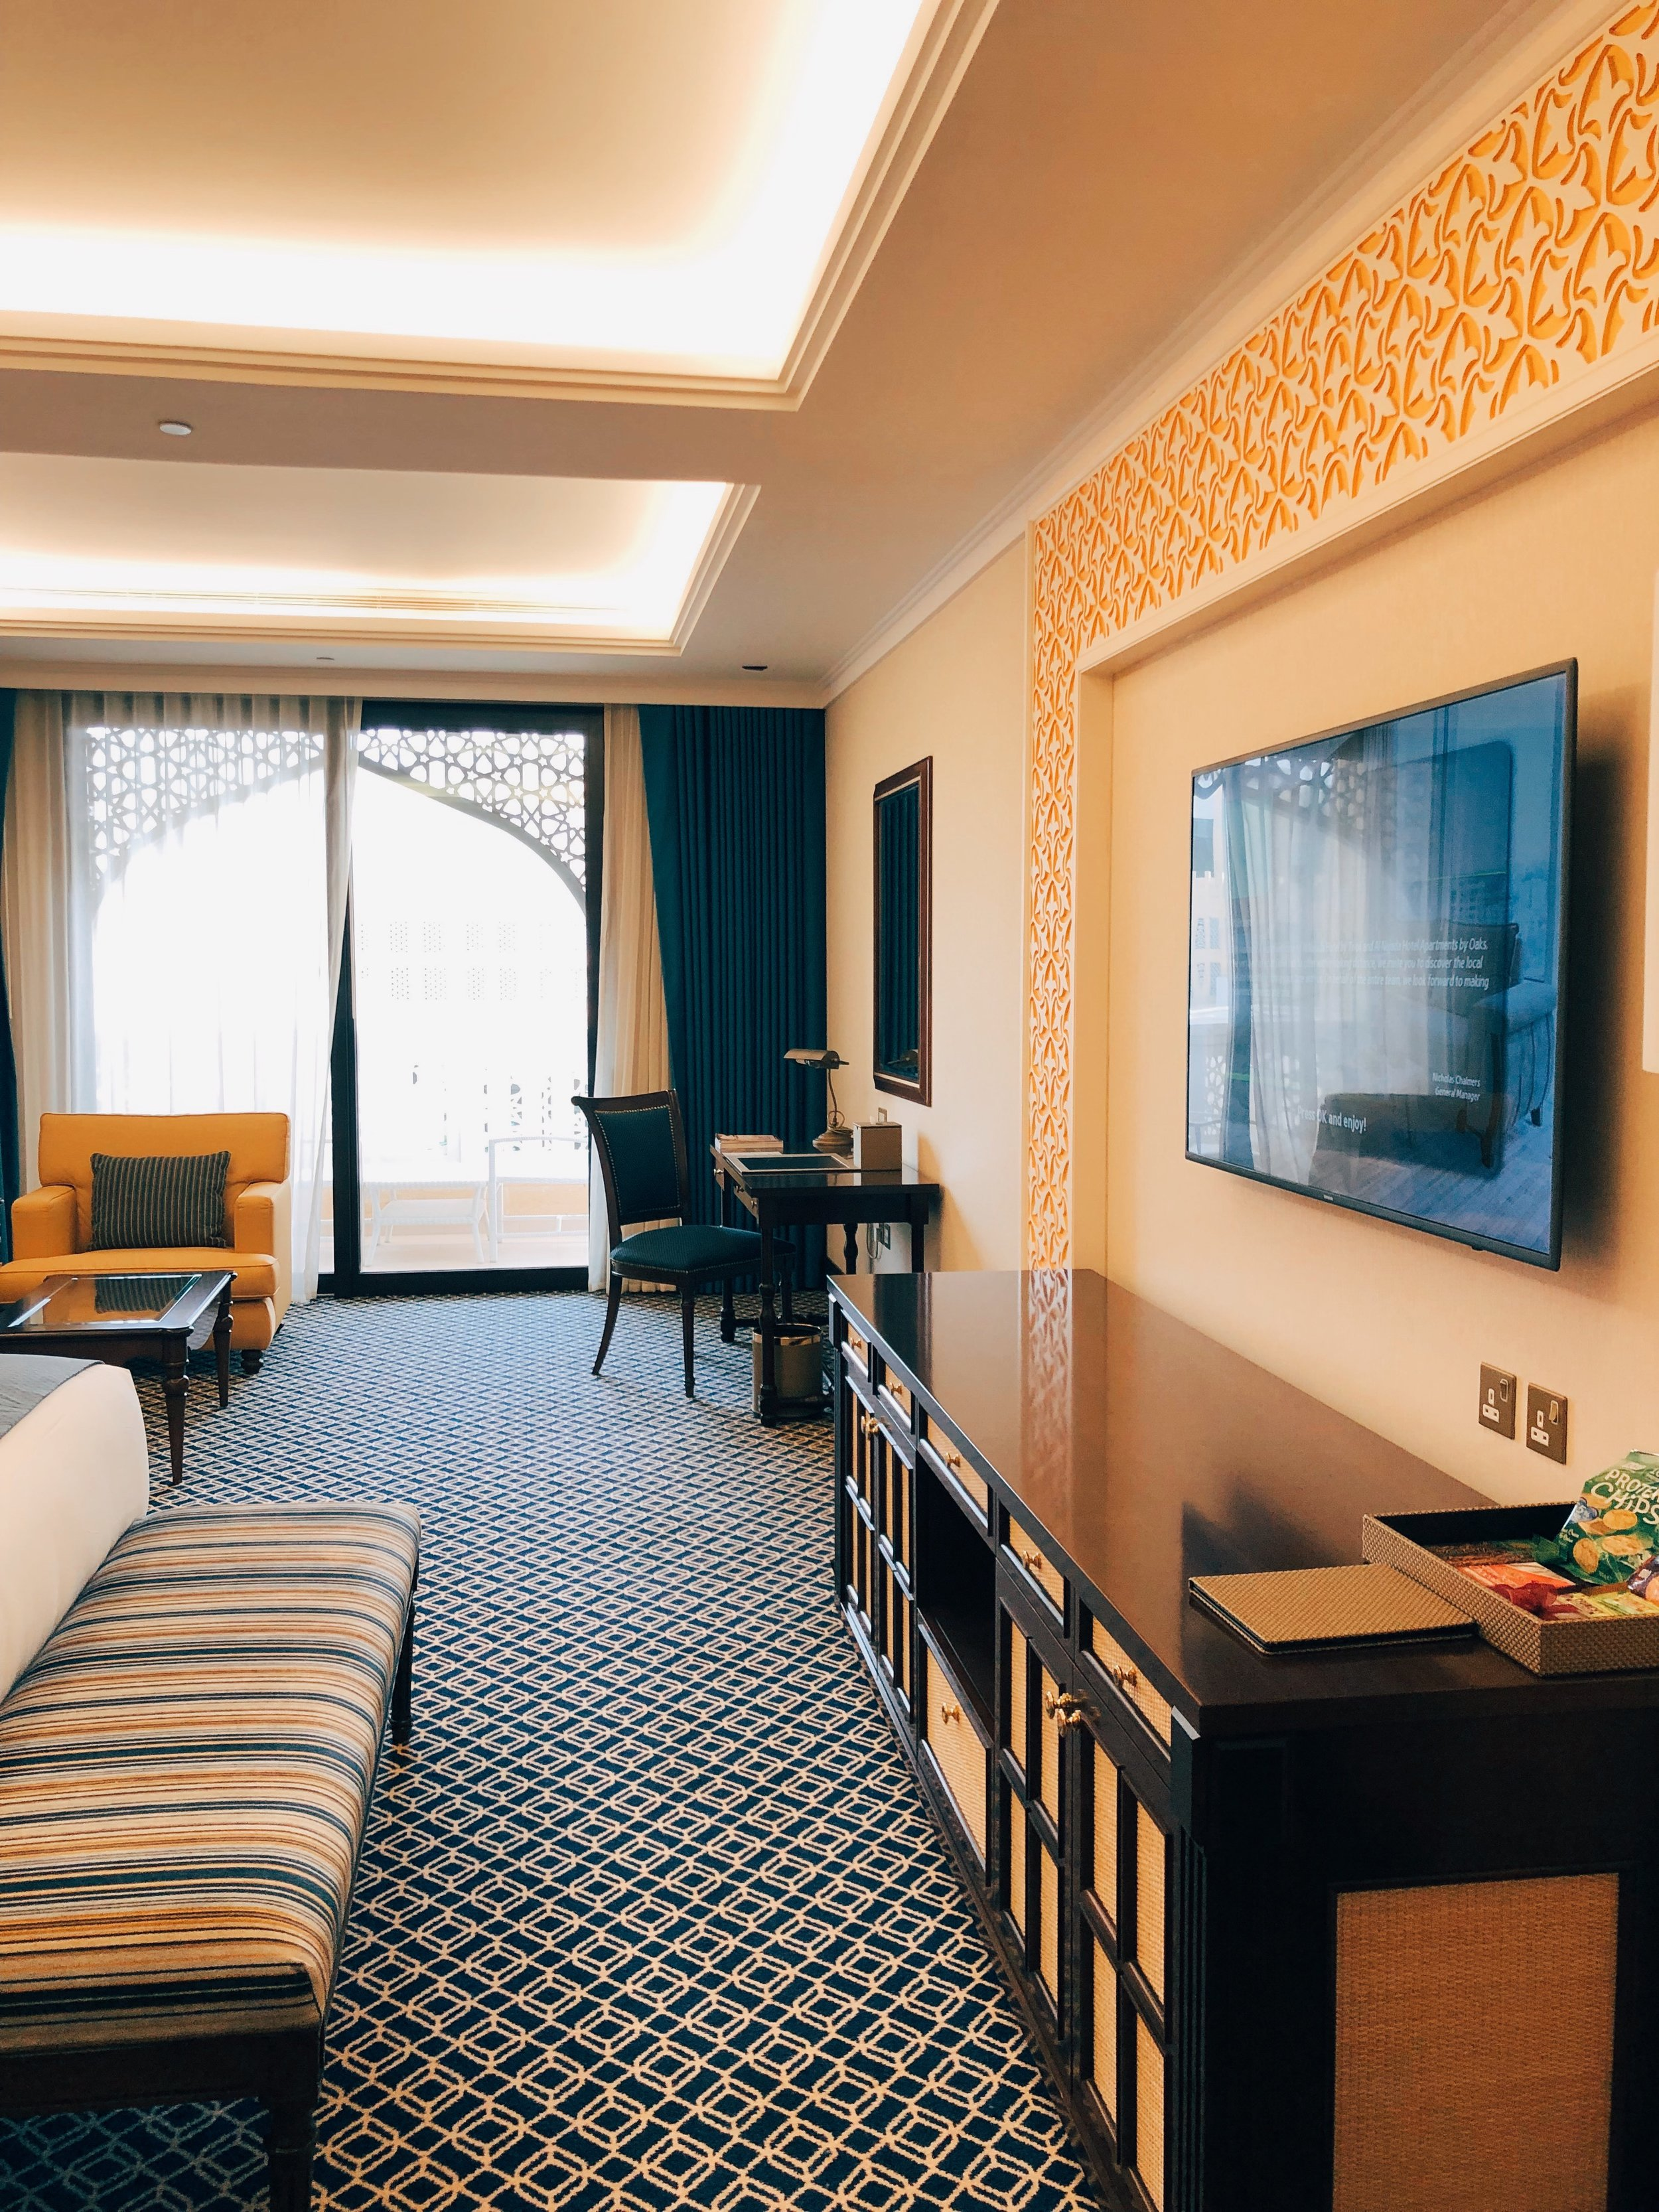 Al Najeda Hotel by Tivoli